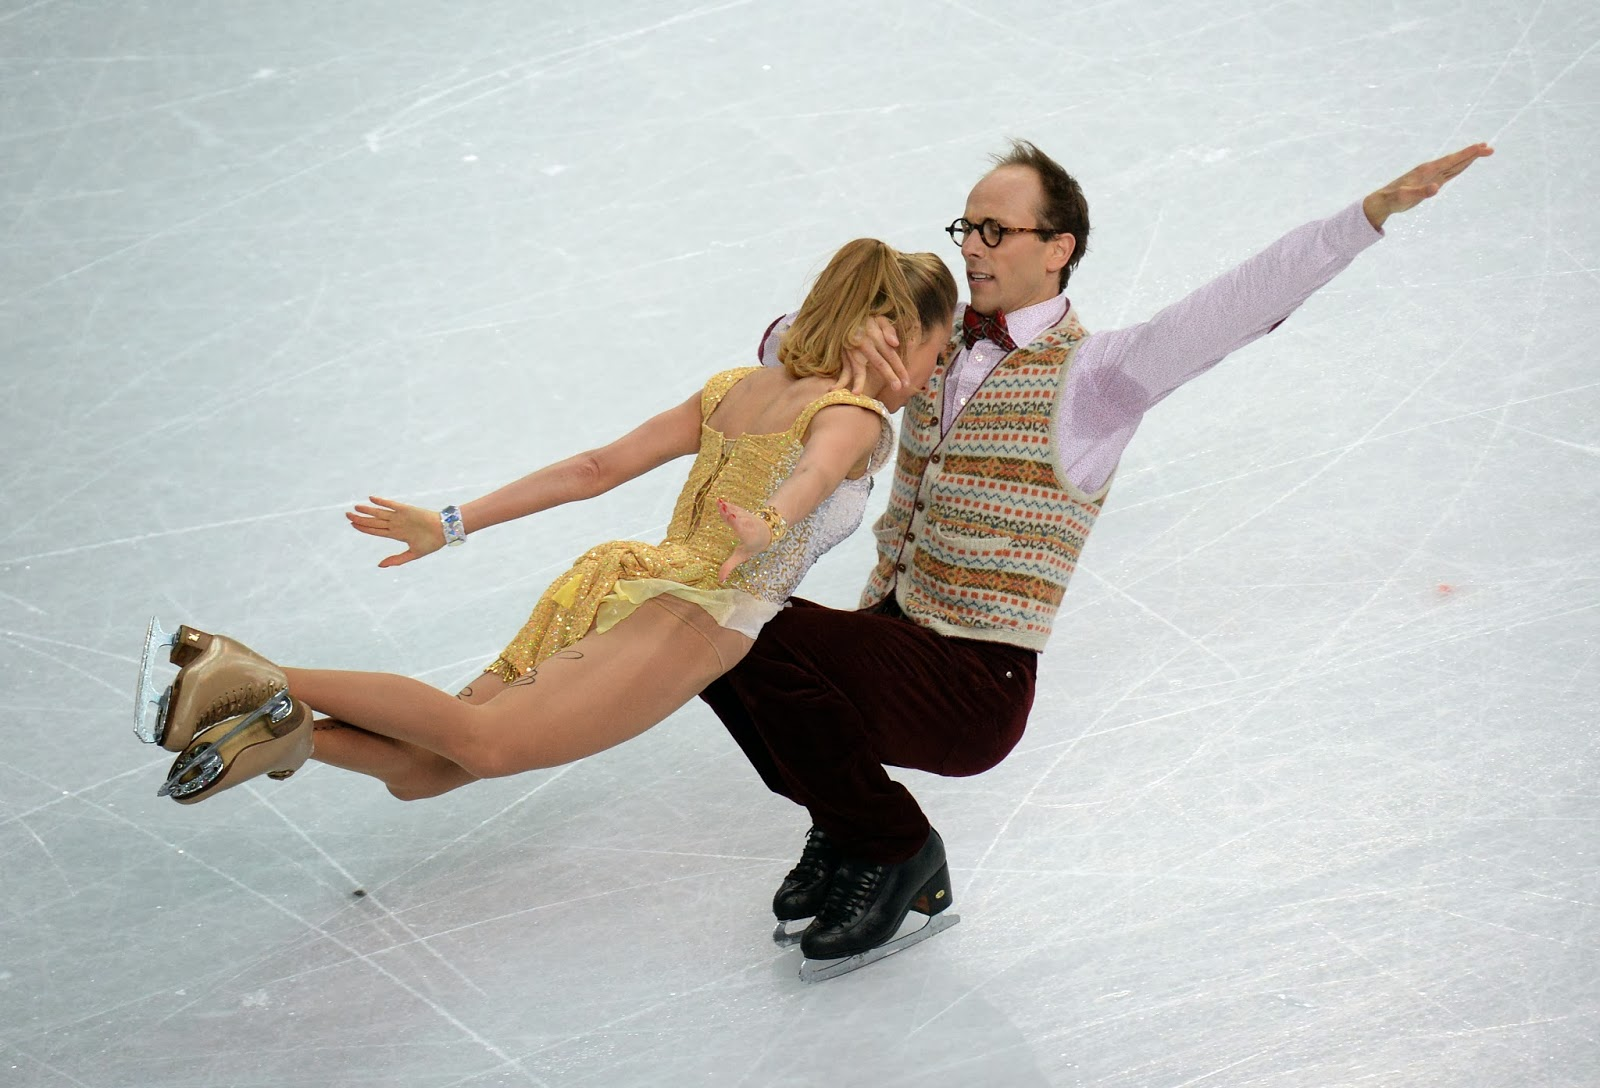 Sochi Olympics Us Won Gold Medal In Figure Skating